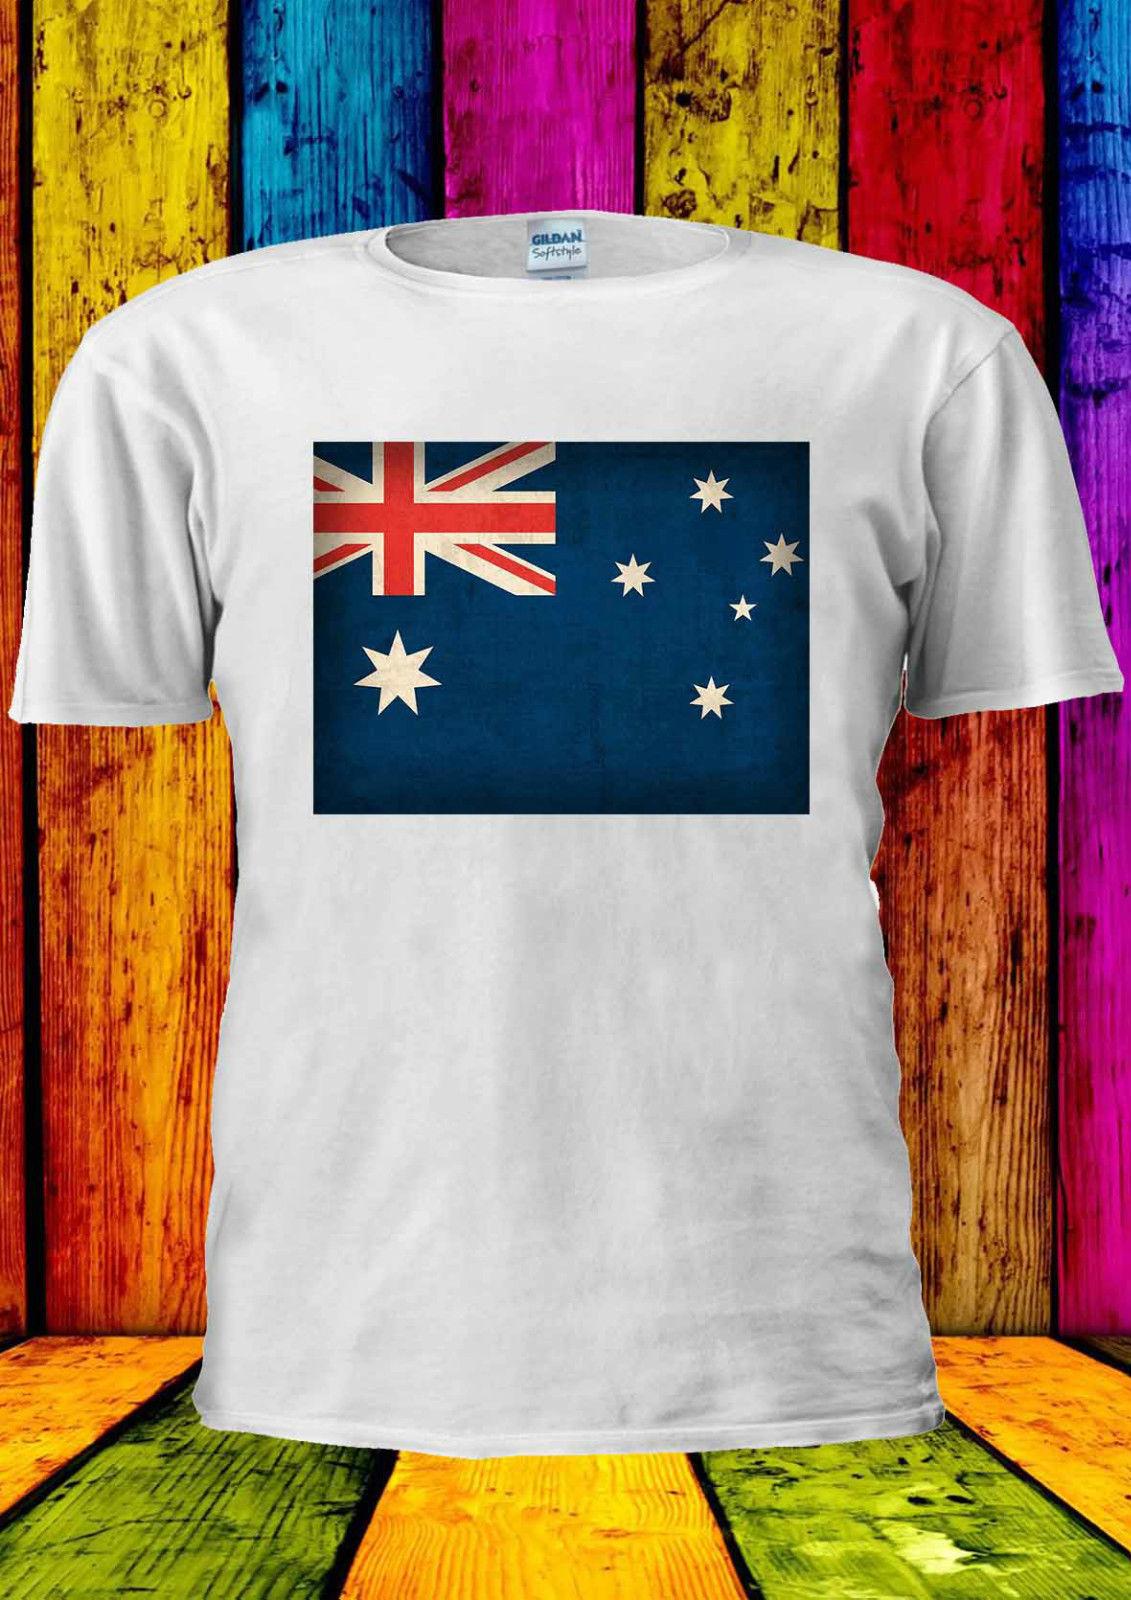 Shirt design online australia - Gildan Australian Flag Australia Sydney T Shirt 1431 Men T Shirt China Mainland